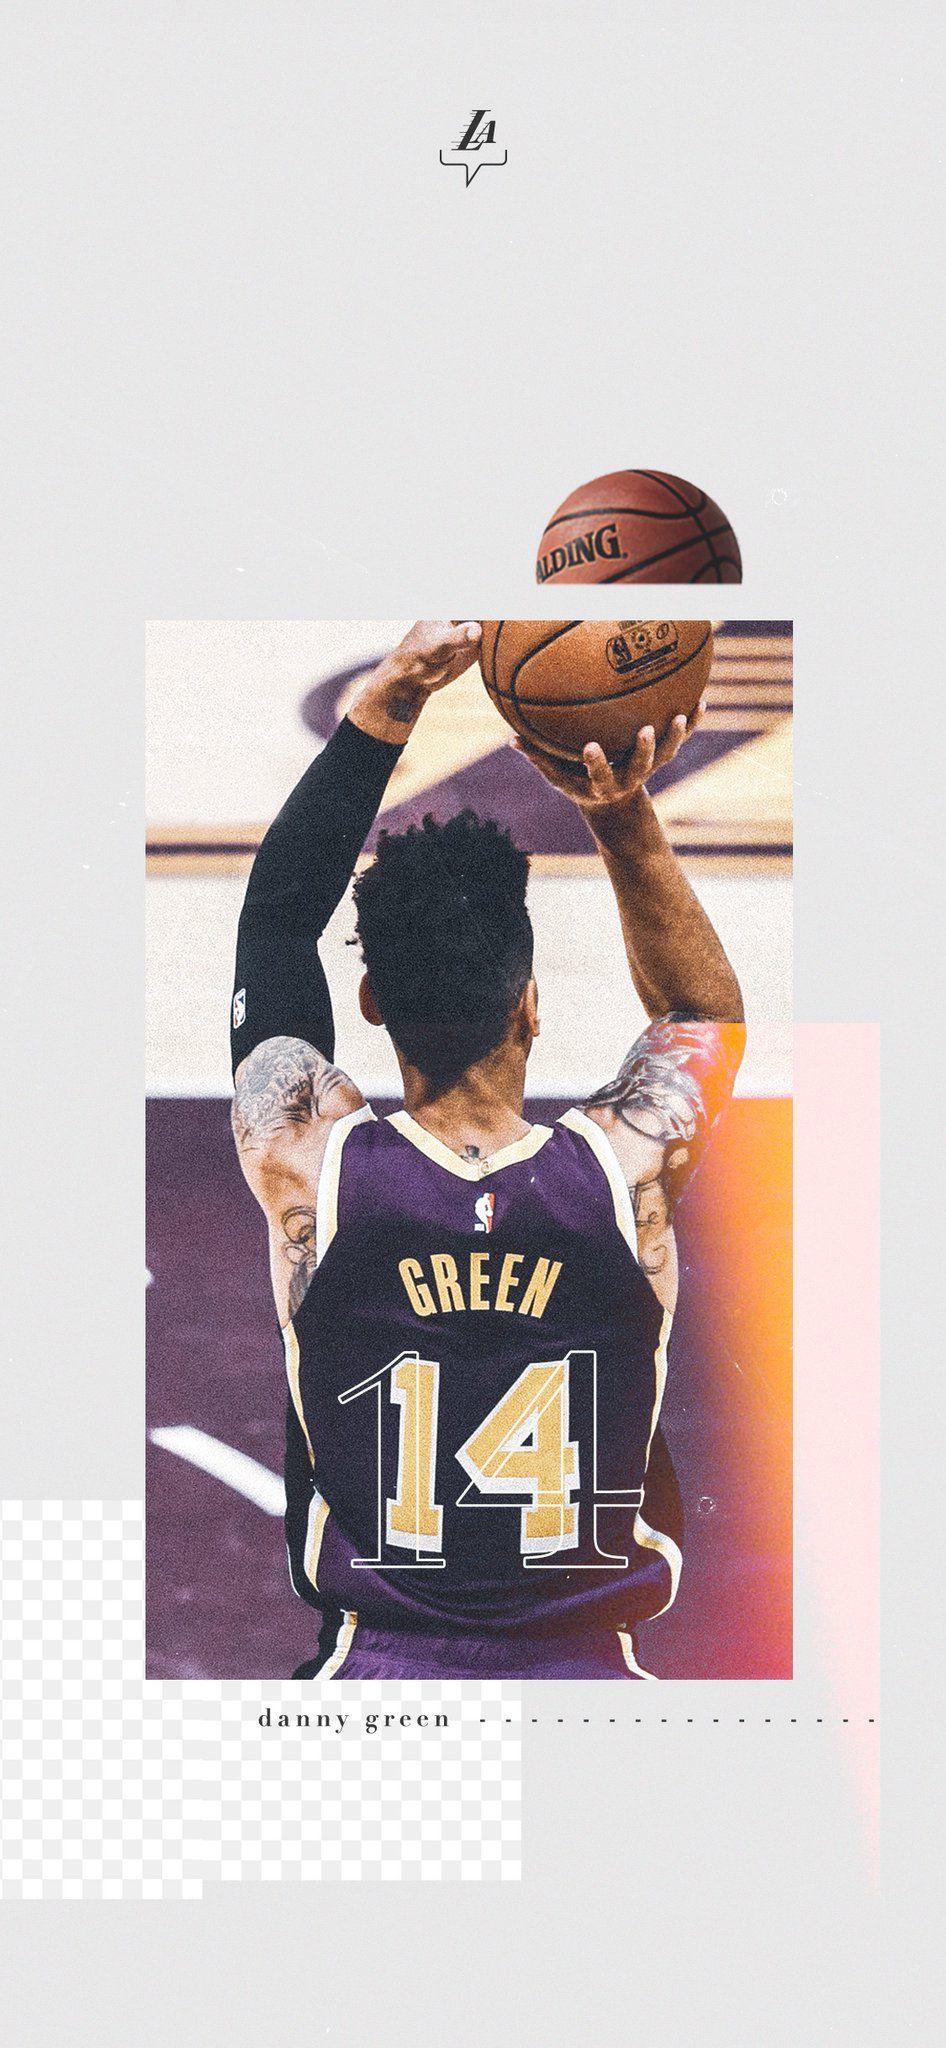 Pin By Mohand On Nba Lakers Wallpaper Basketball Design Kobe Bryant Wallpaper